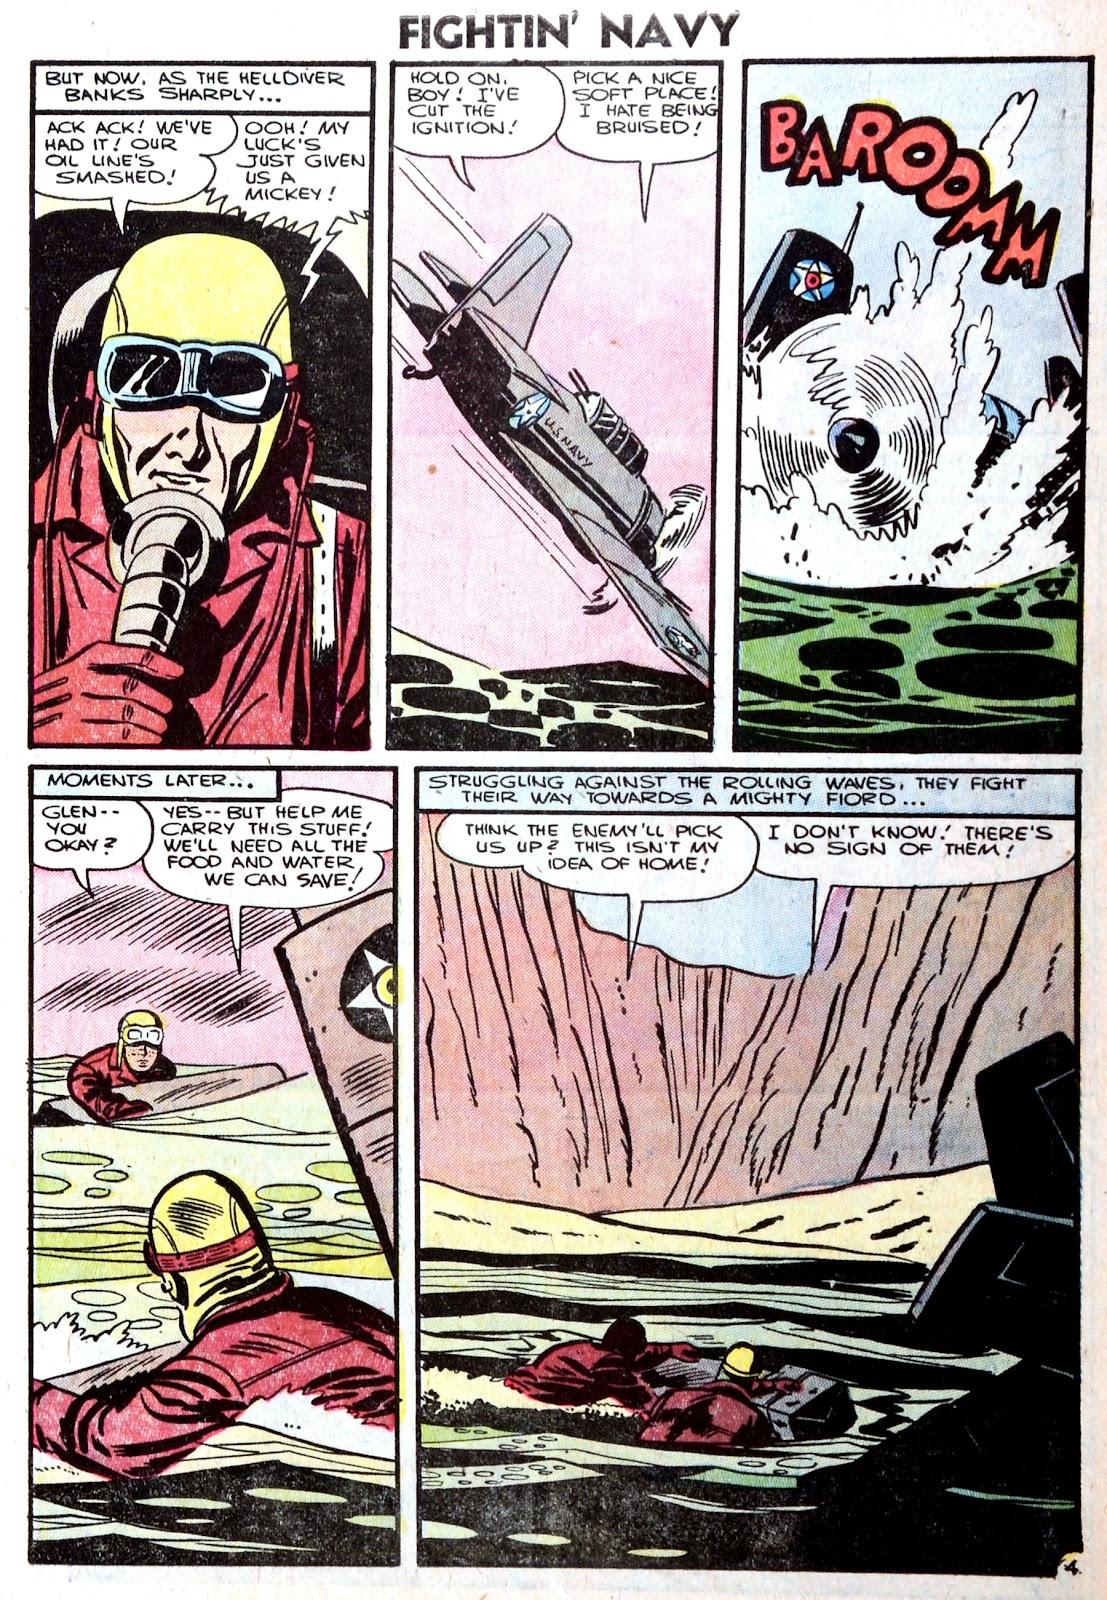 Read online Fightin' Navy comic -  Issue #75 - 7